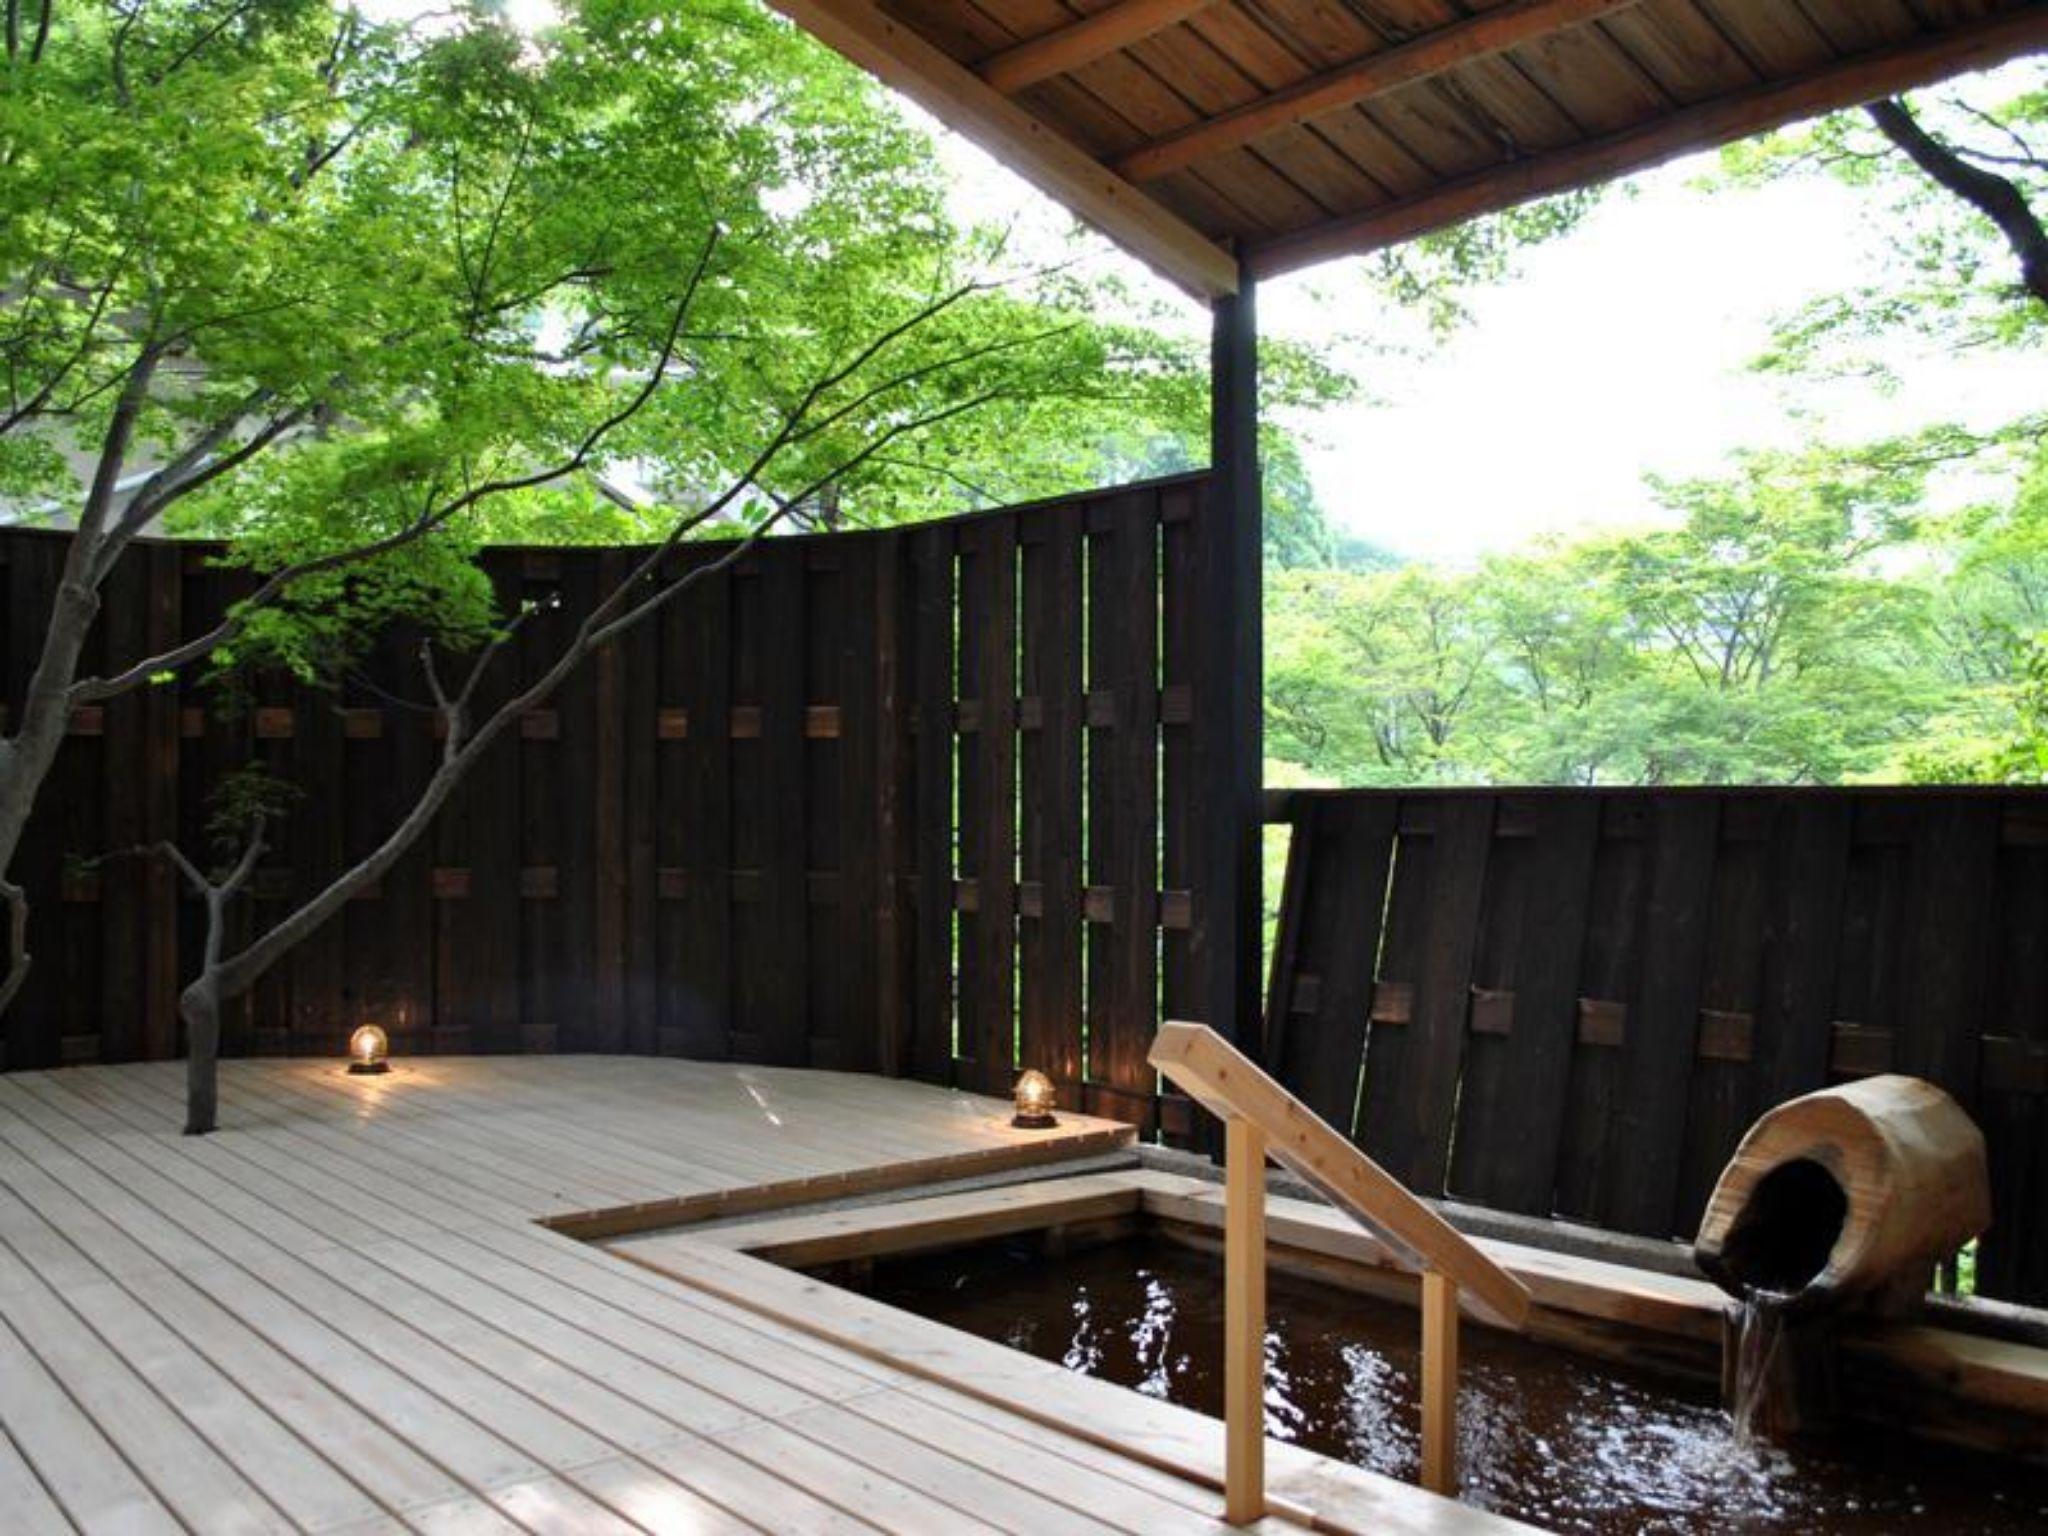 Negiya Traditional Japanese Spa Ryokan, Nishinomiya